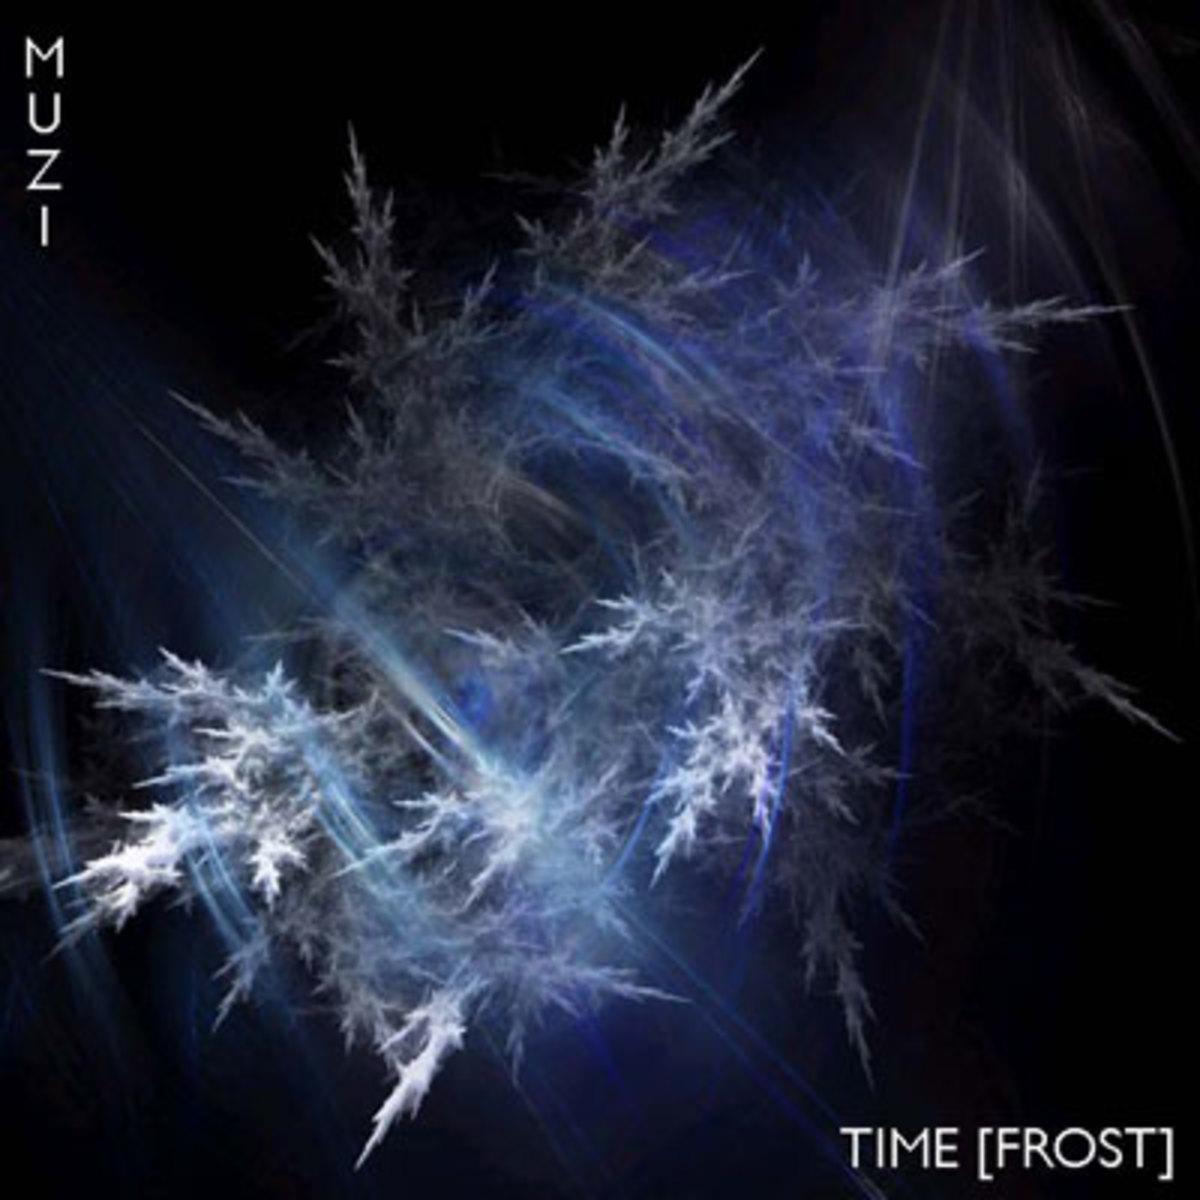 muzi-timefrost.jpg